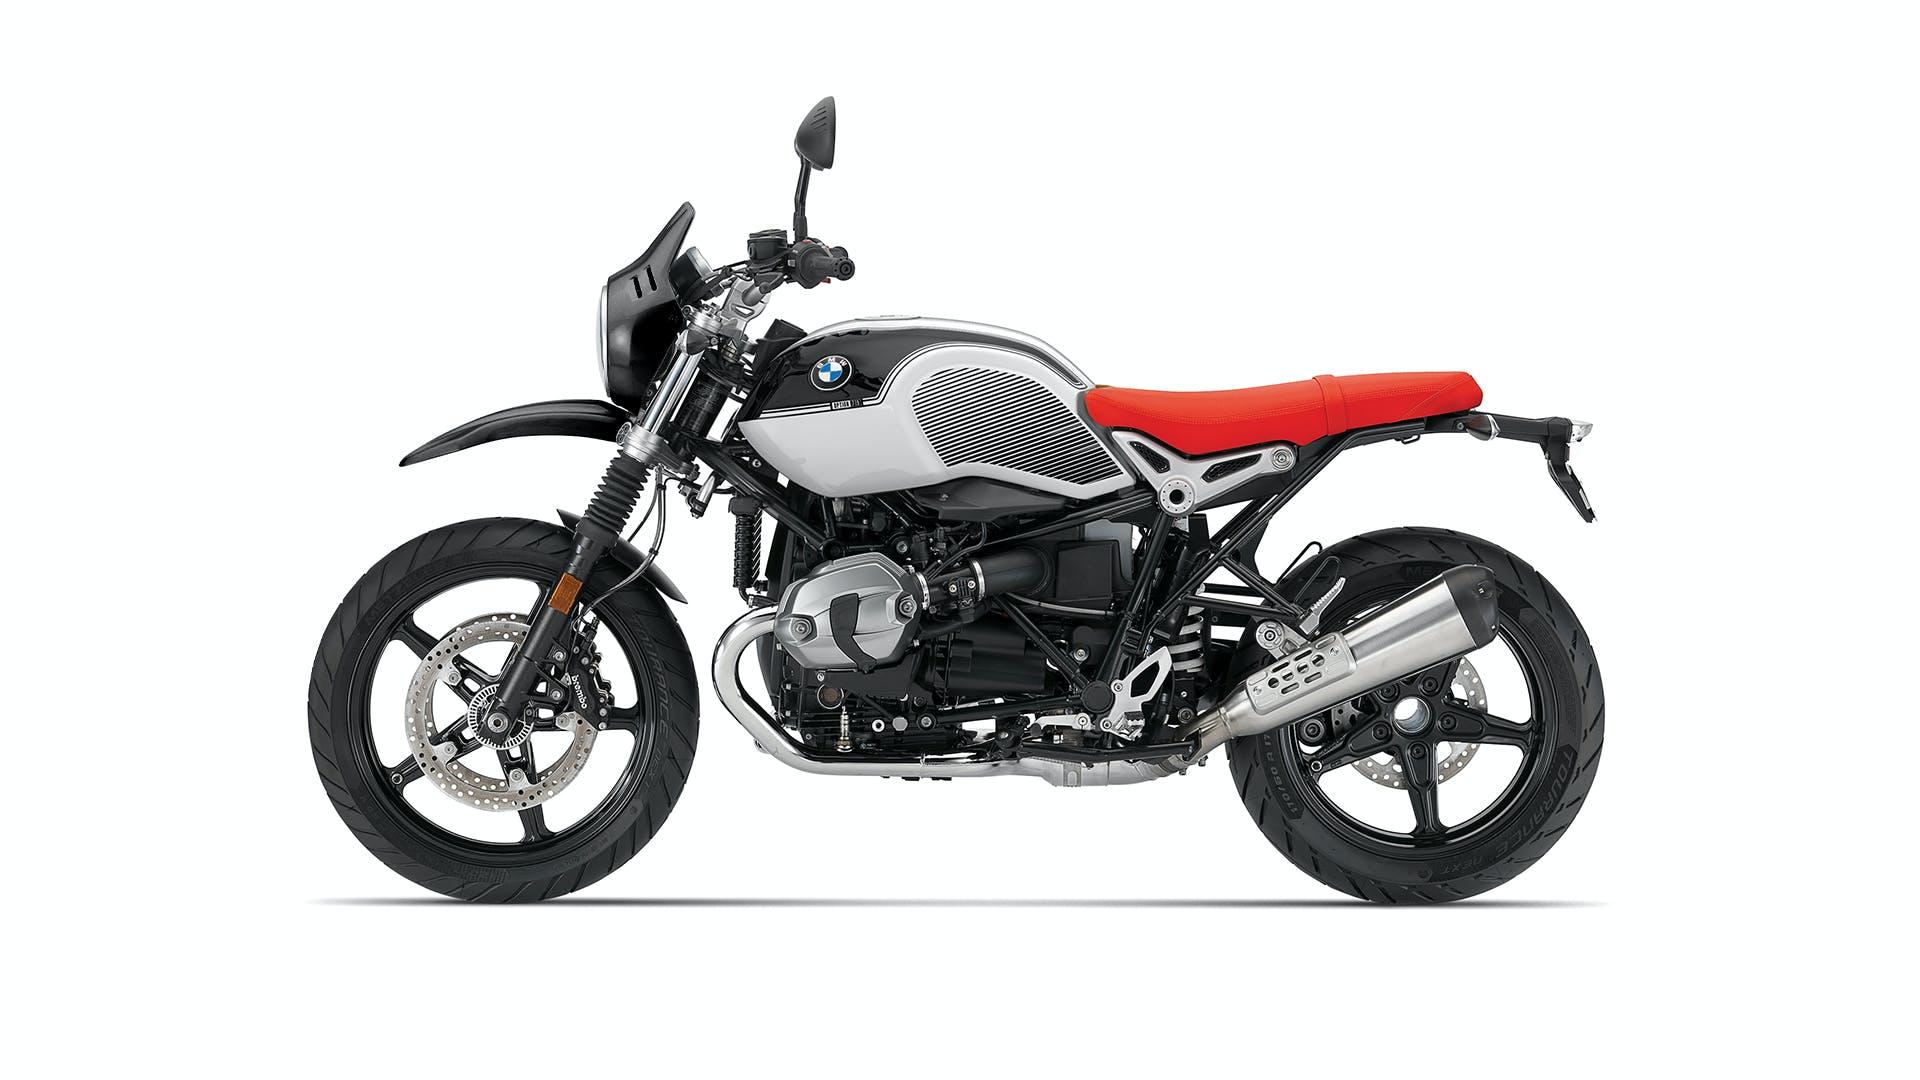 BMW R nineT Urban G/S Spezial in option 719 black storm metallic / light white colour